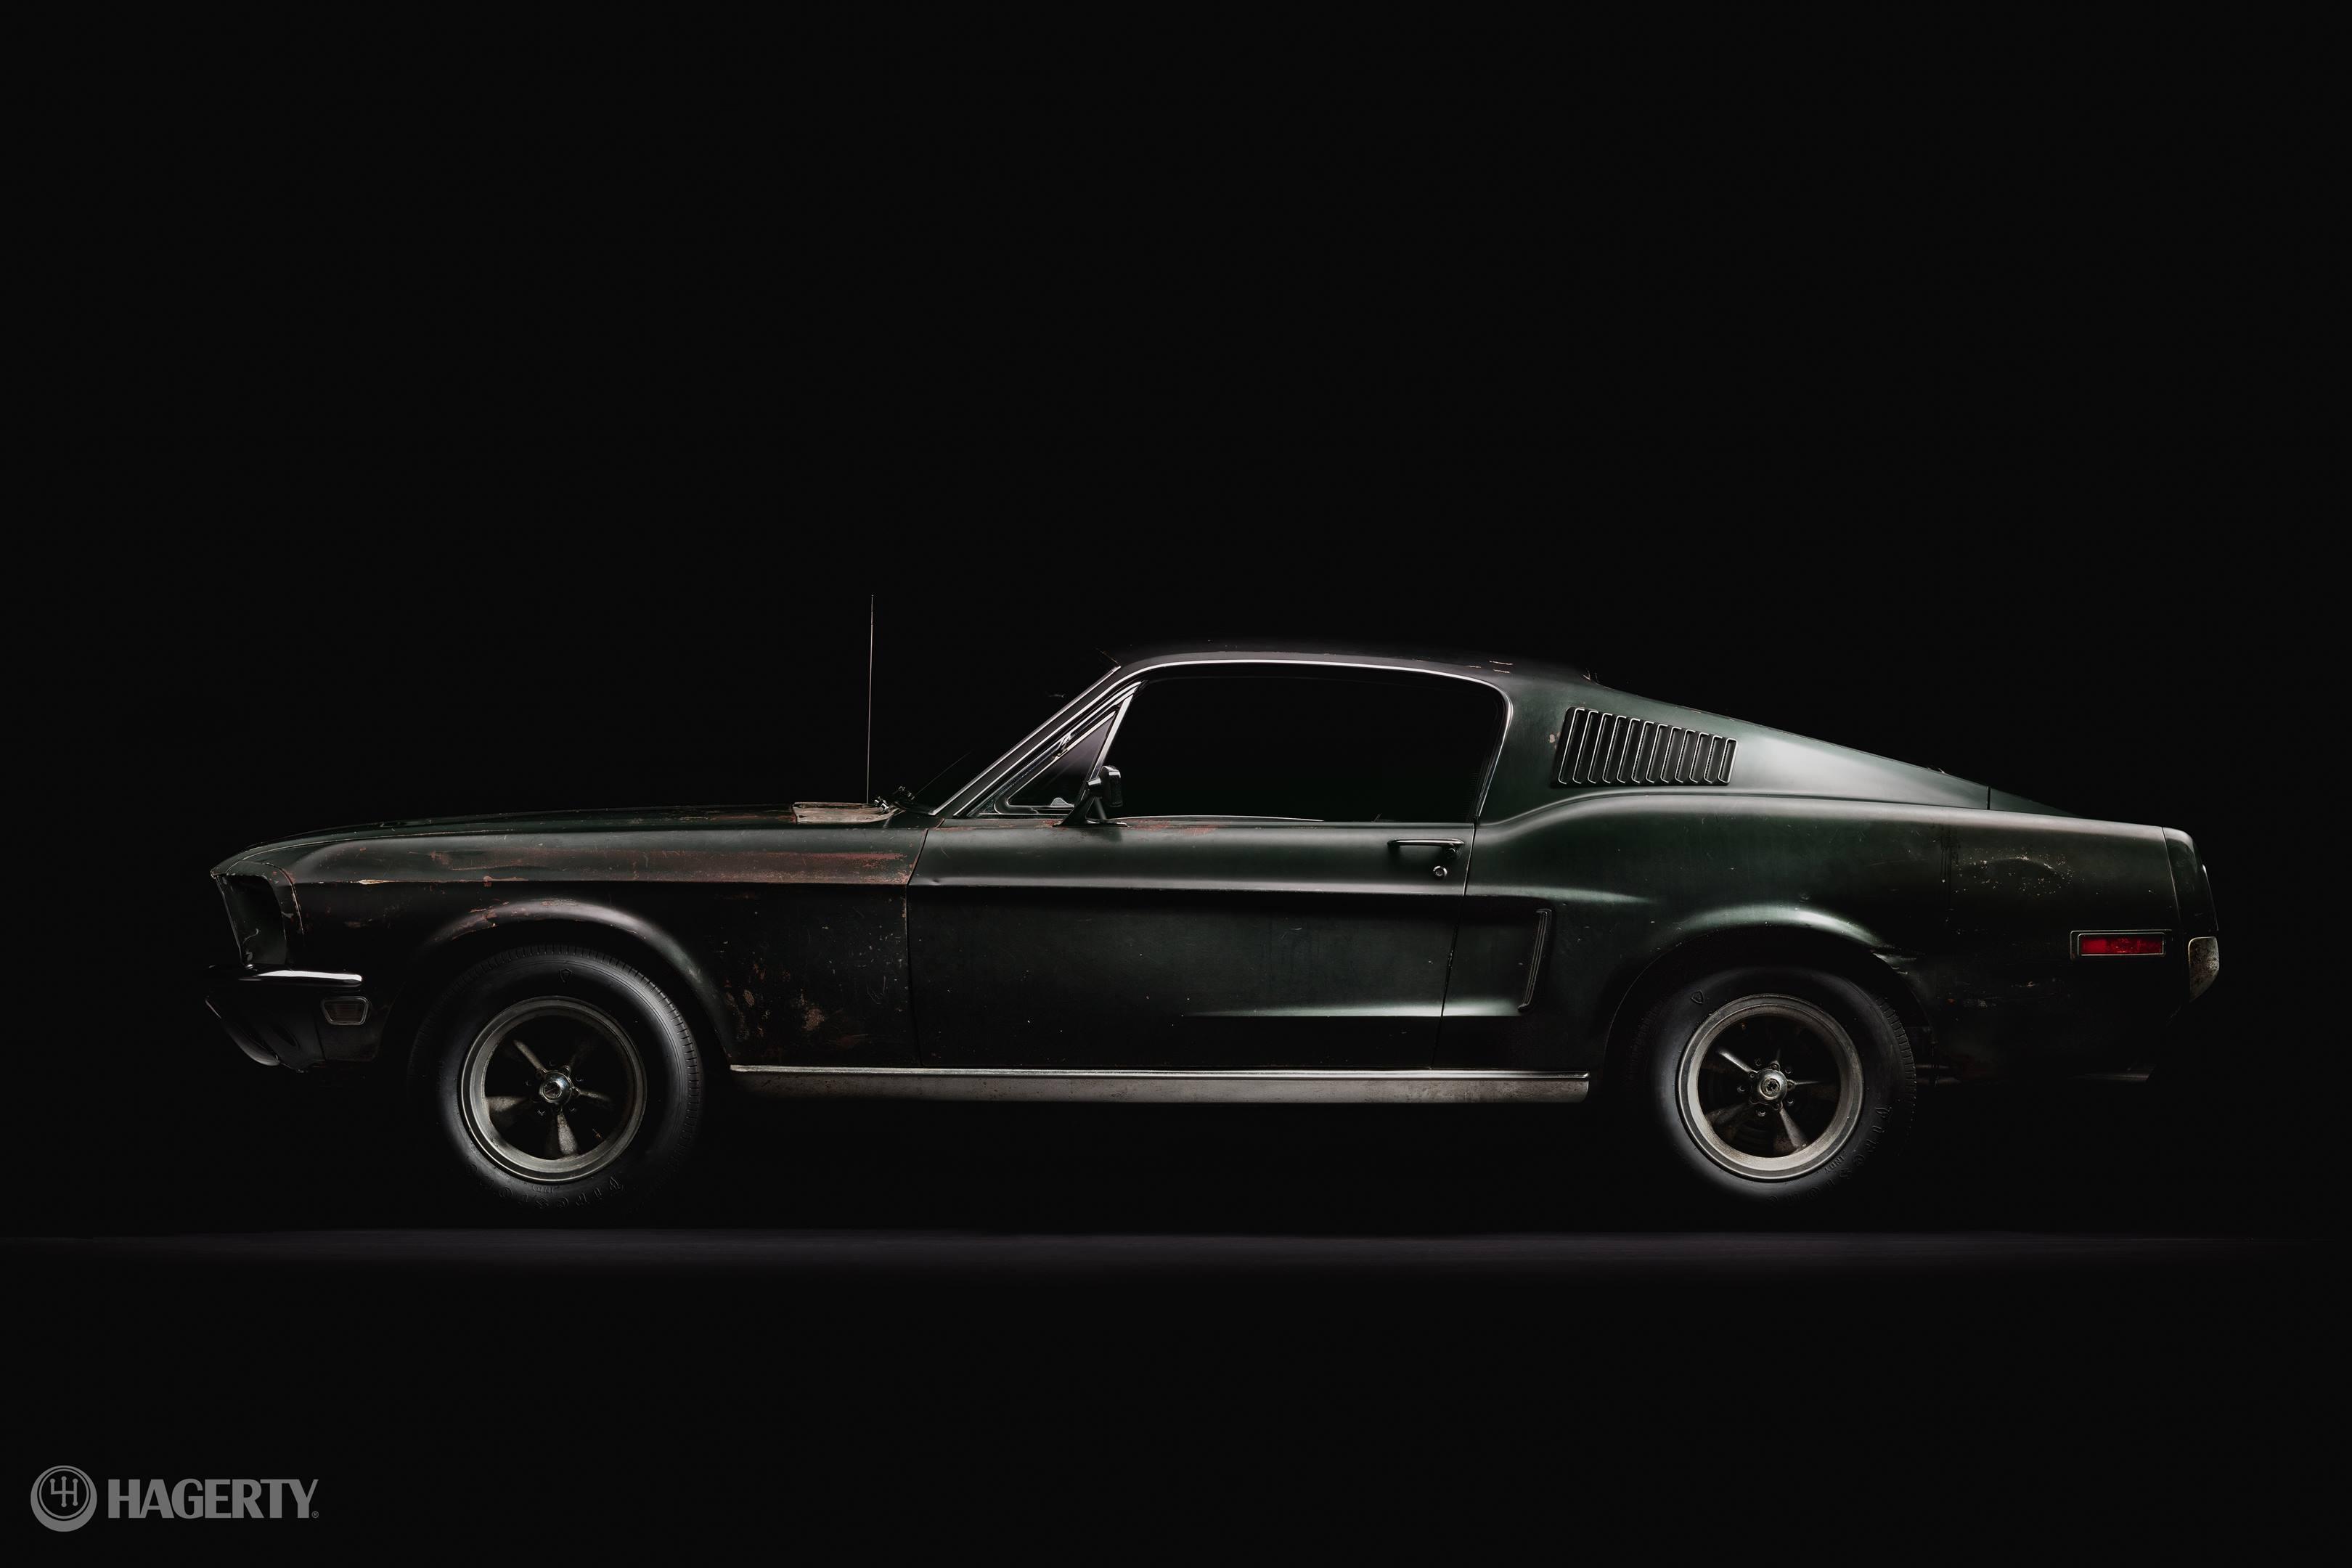 Bullitt Mustang profile